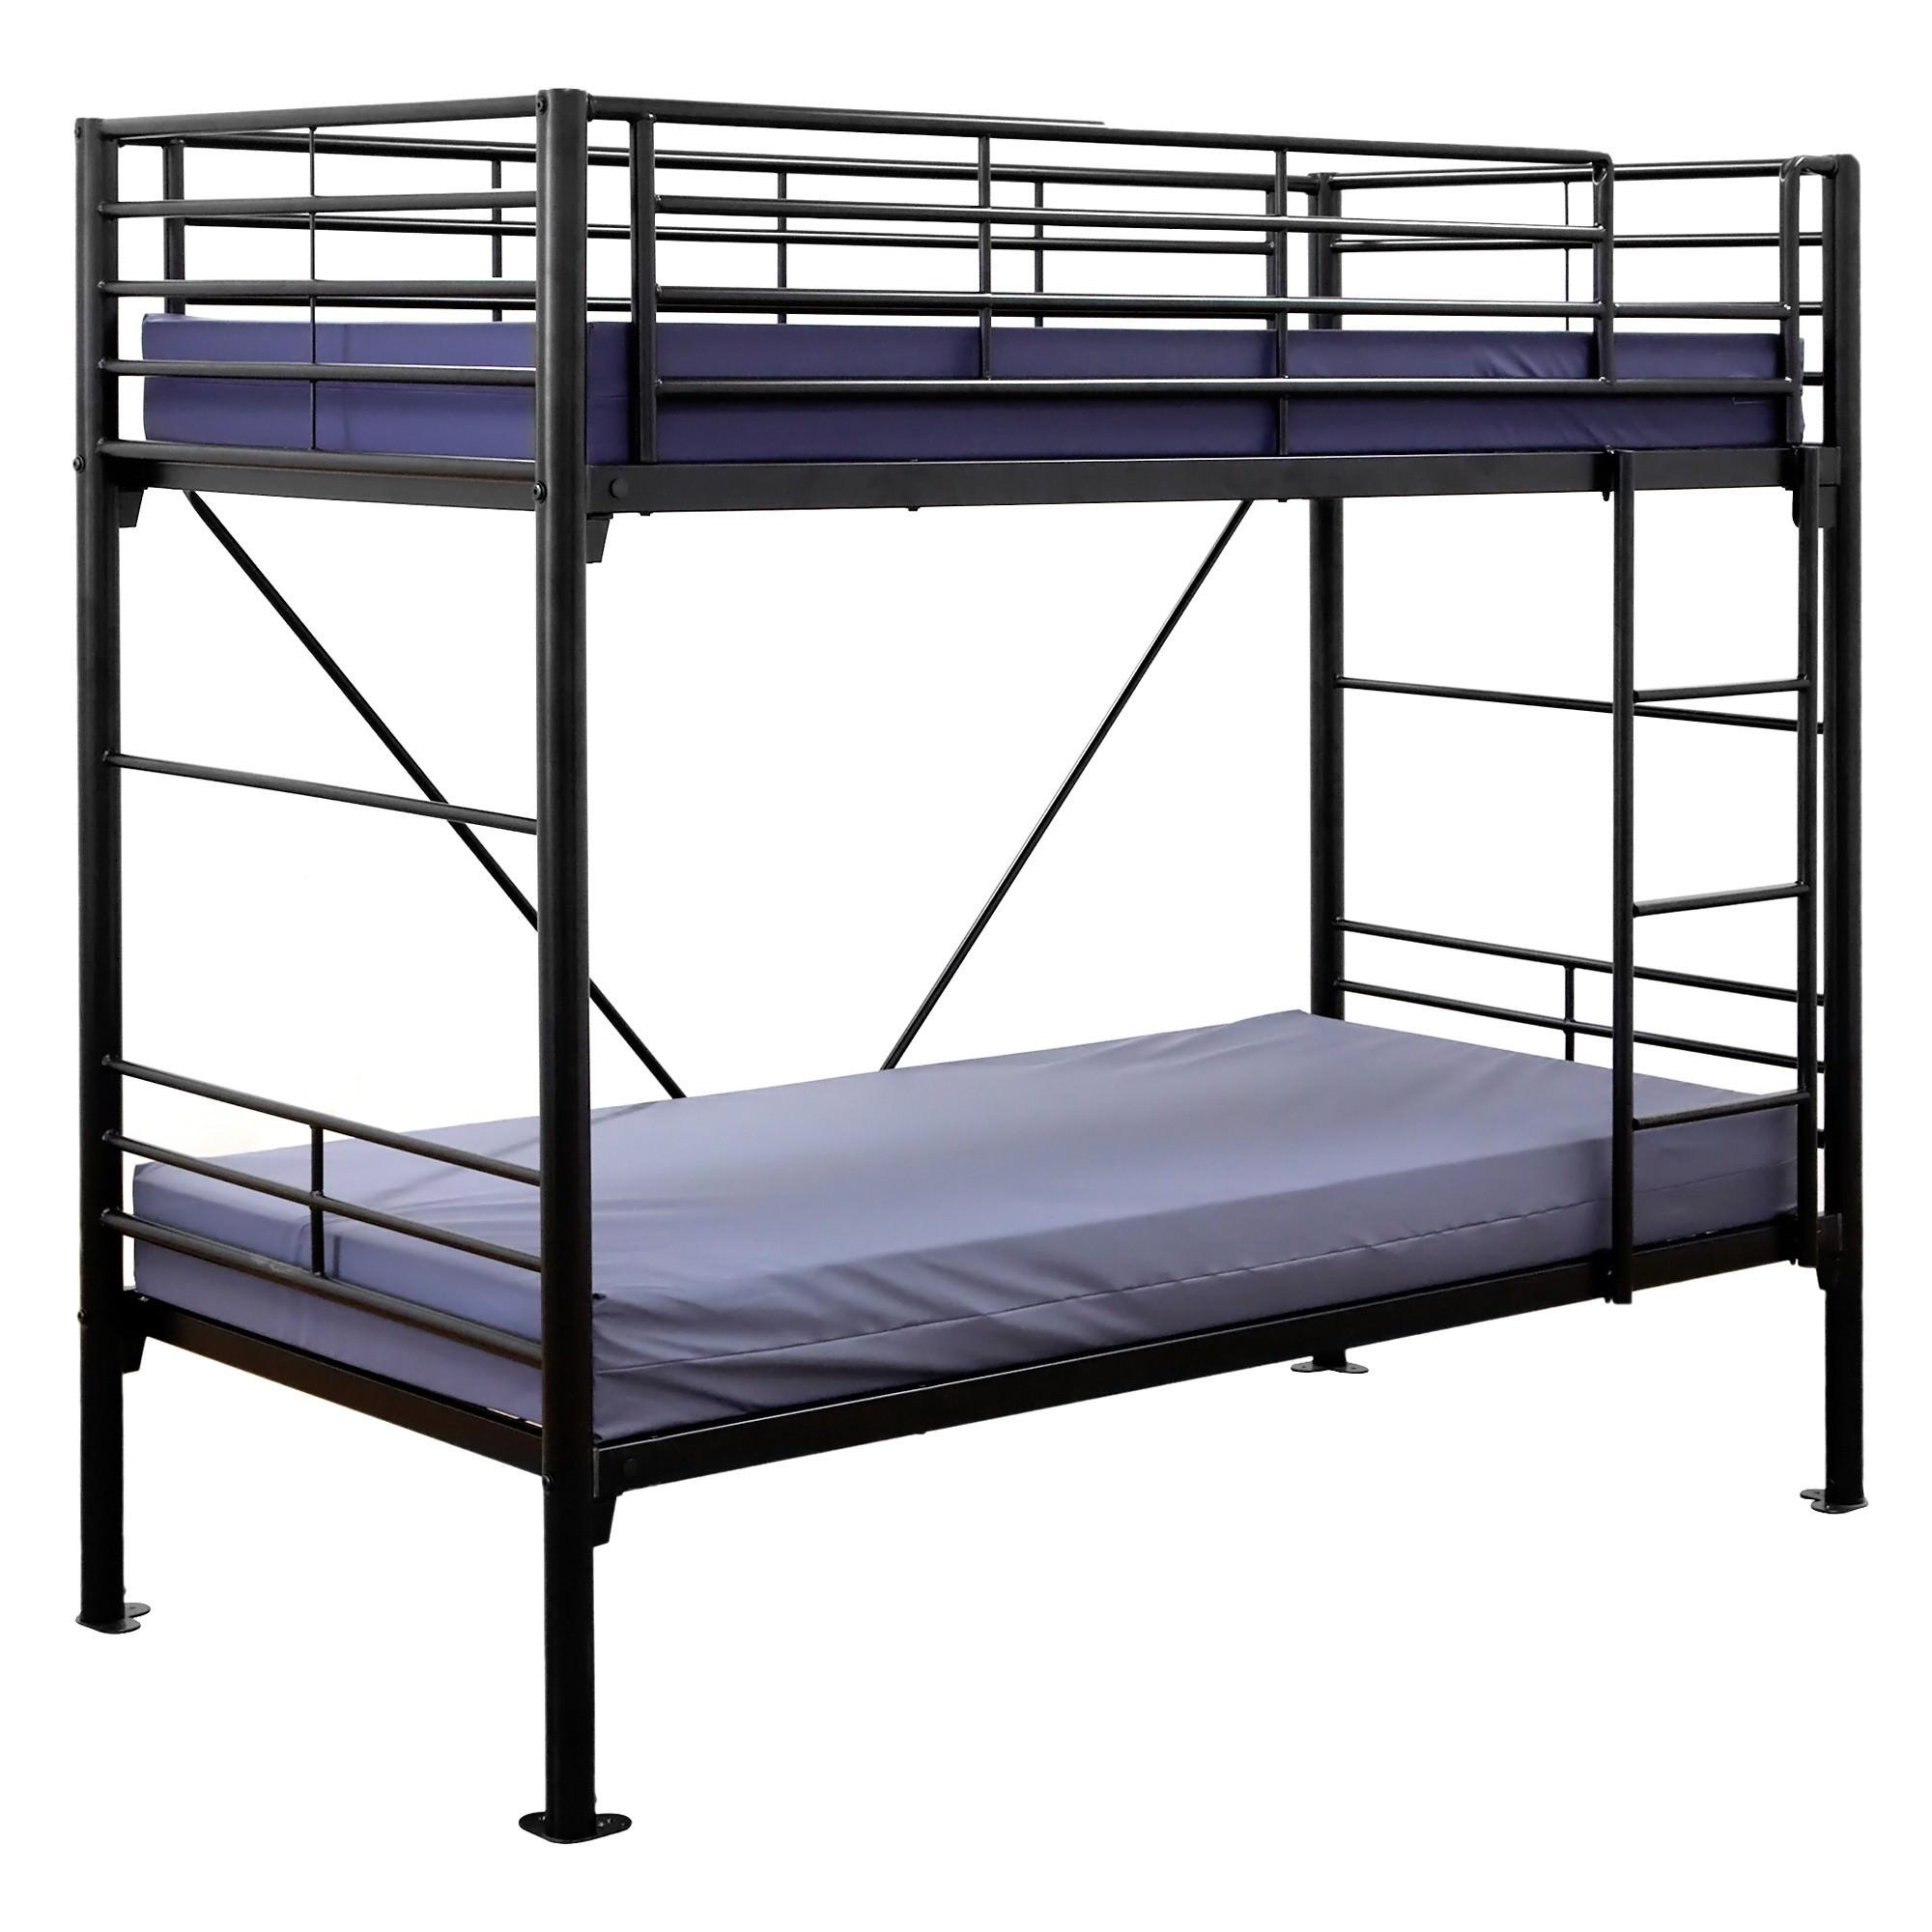 Travers Commercial Grade Metal Bunk Bed, Single, Black